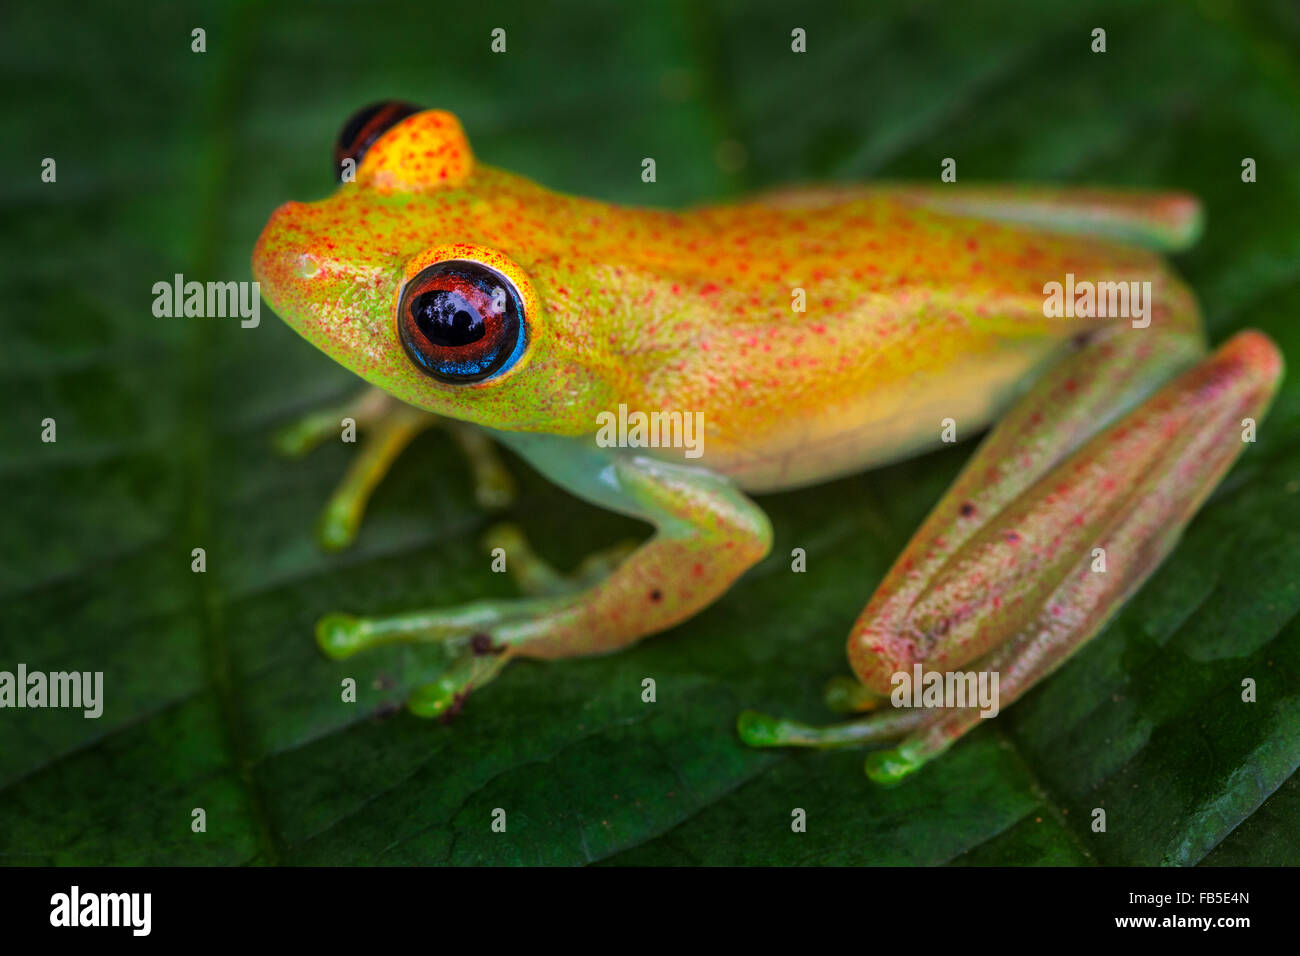 A tiny tree frog on a leaf, Andasibe National Park, Madagascar. - Stock Image